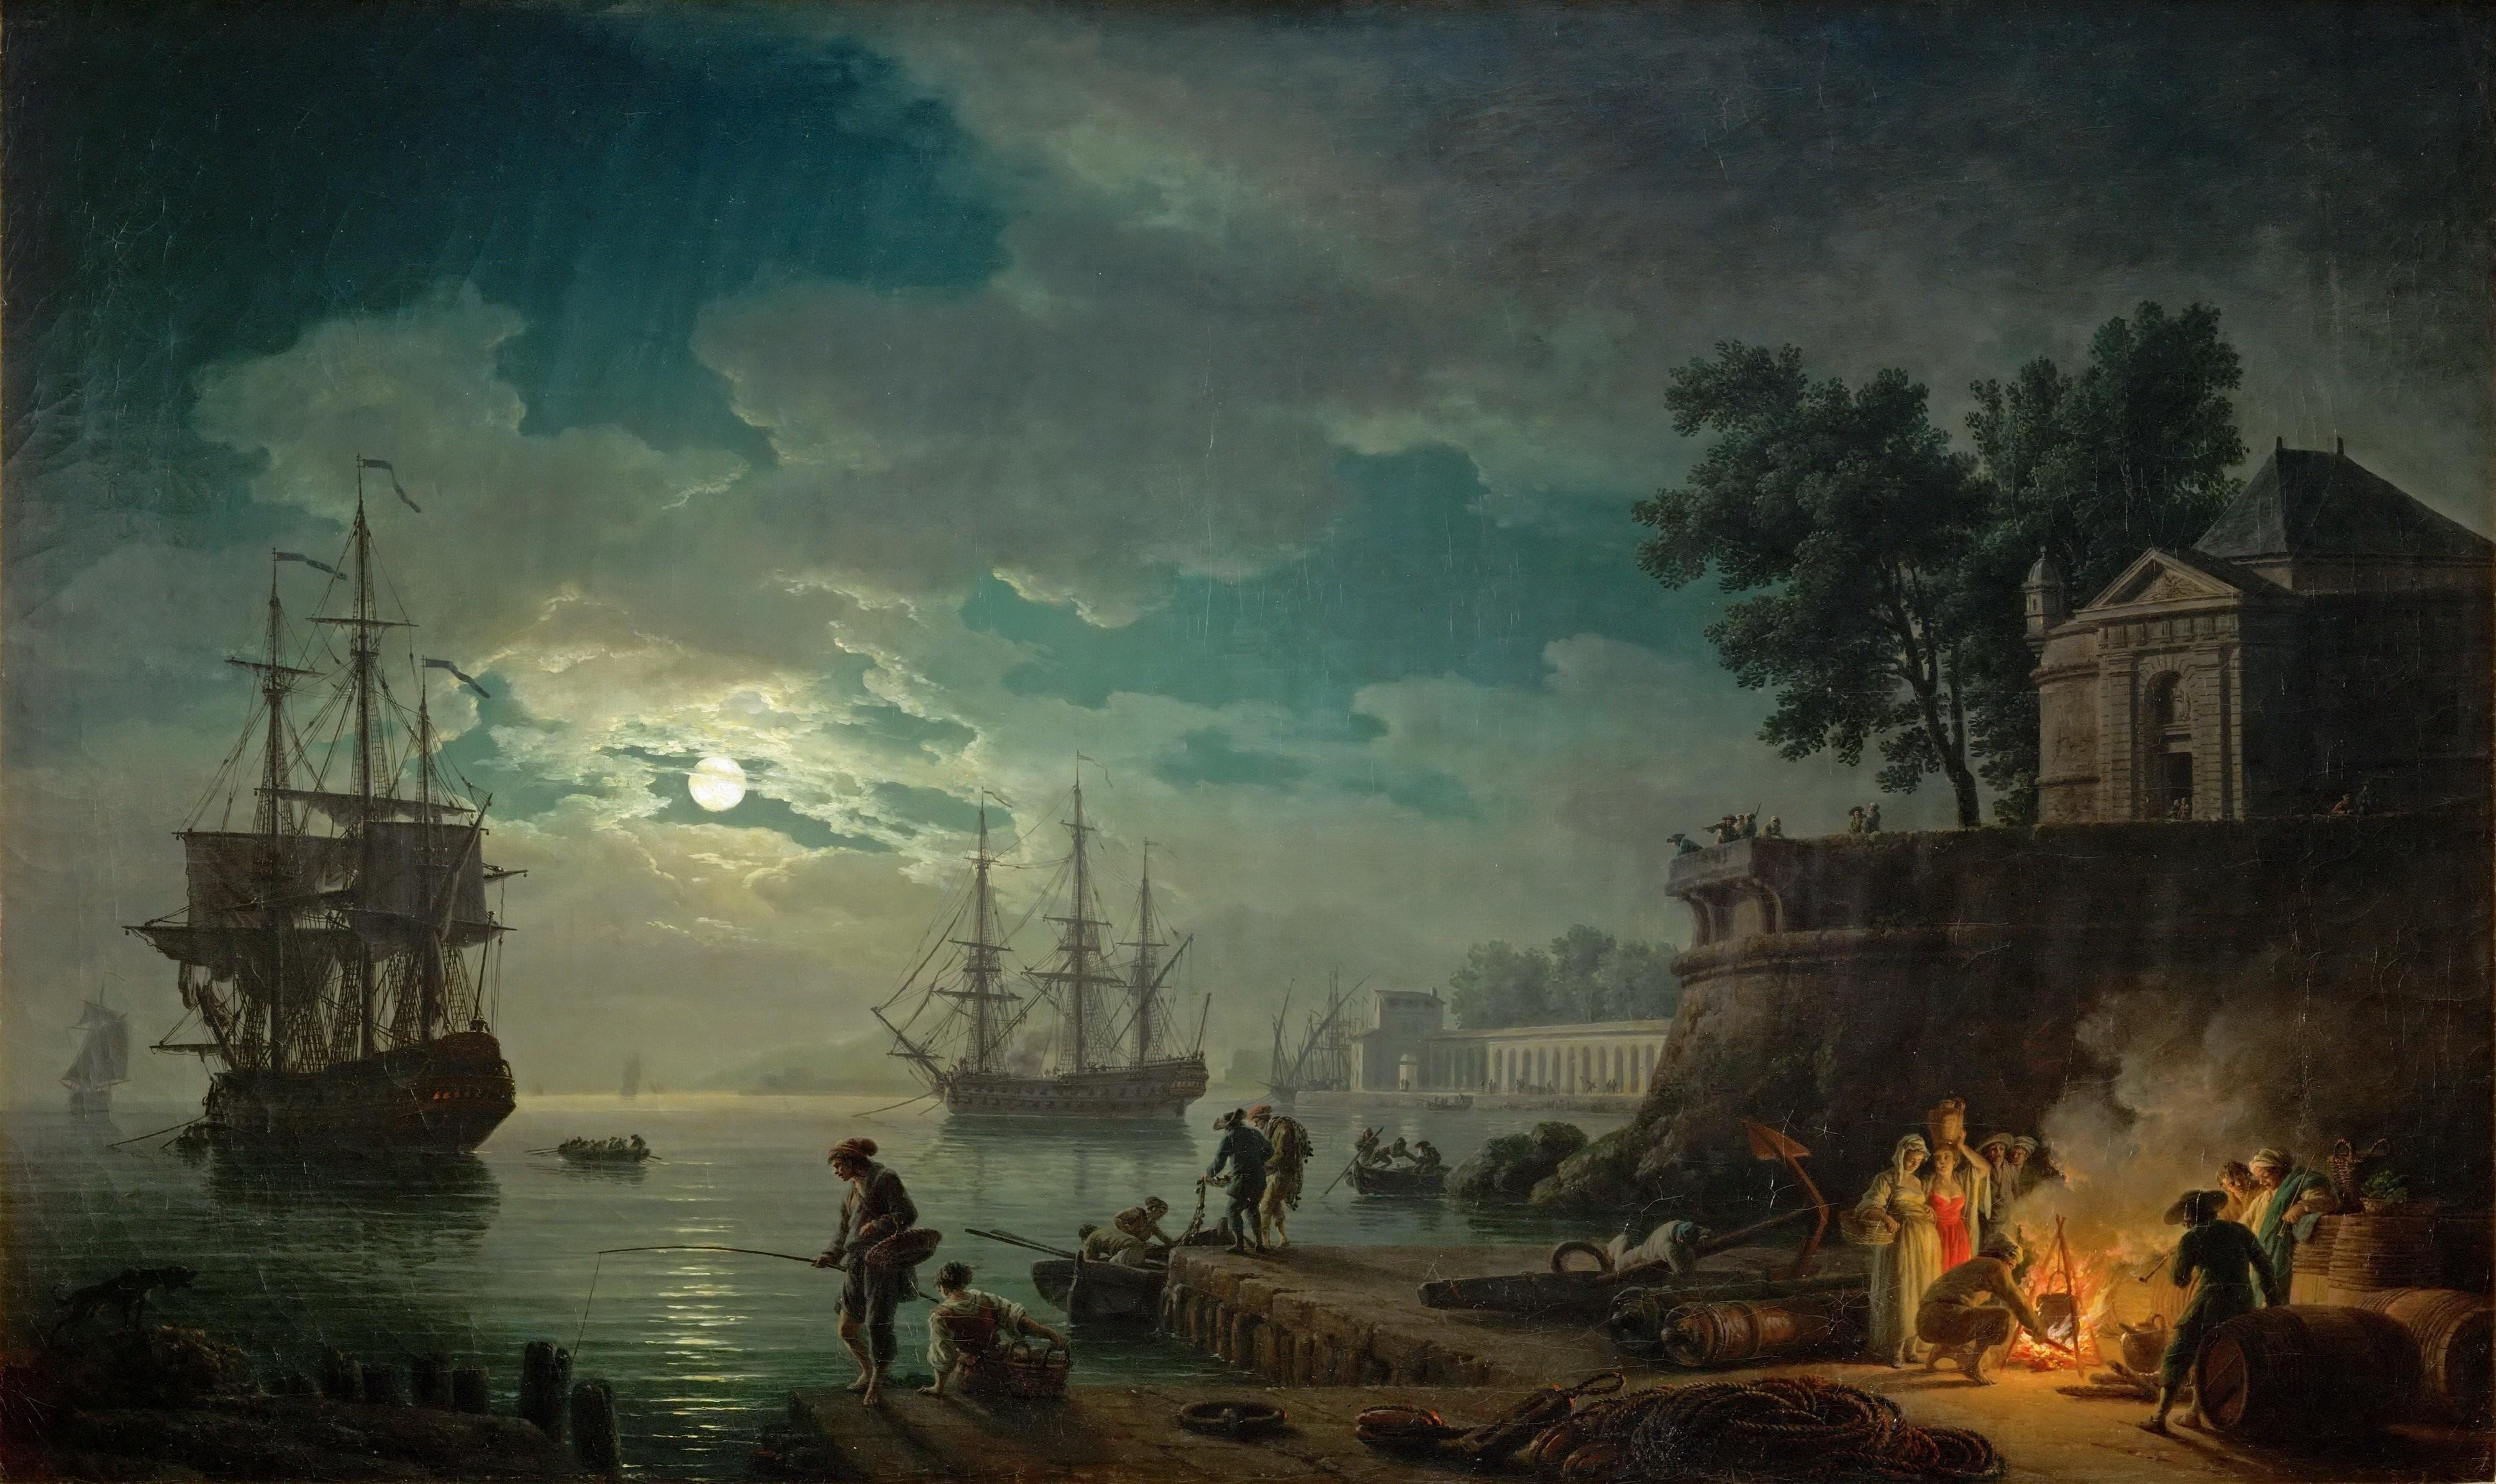 Wallpaper : men, painting, people, boat, sailing ship, women